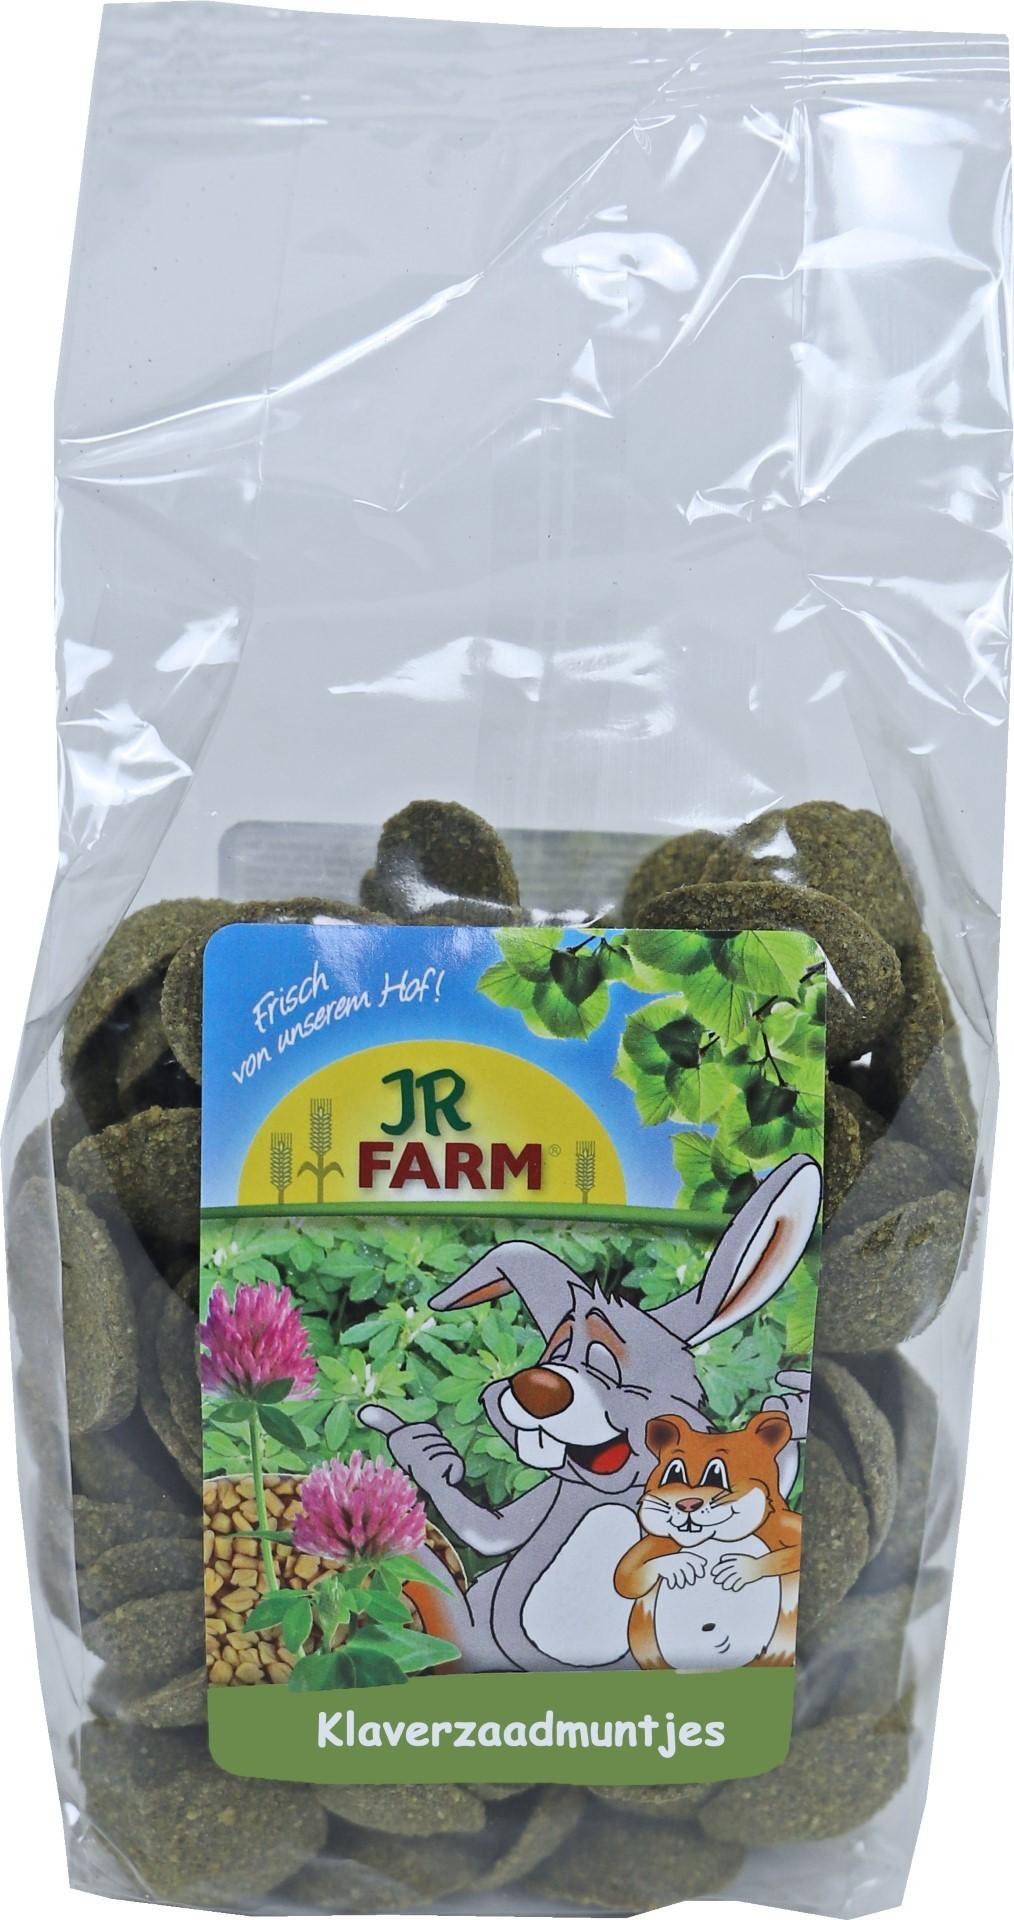 JR Farm knaagdier klaverzaadmuntjes 200 gram 05598